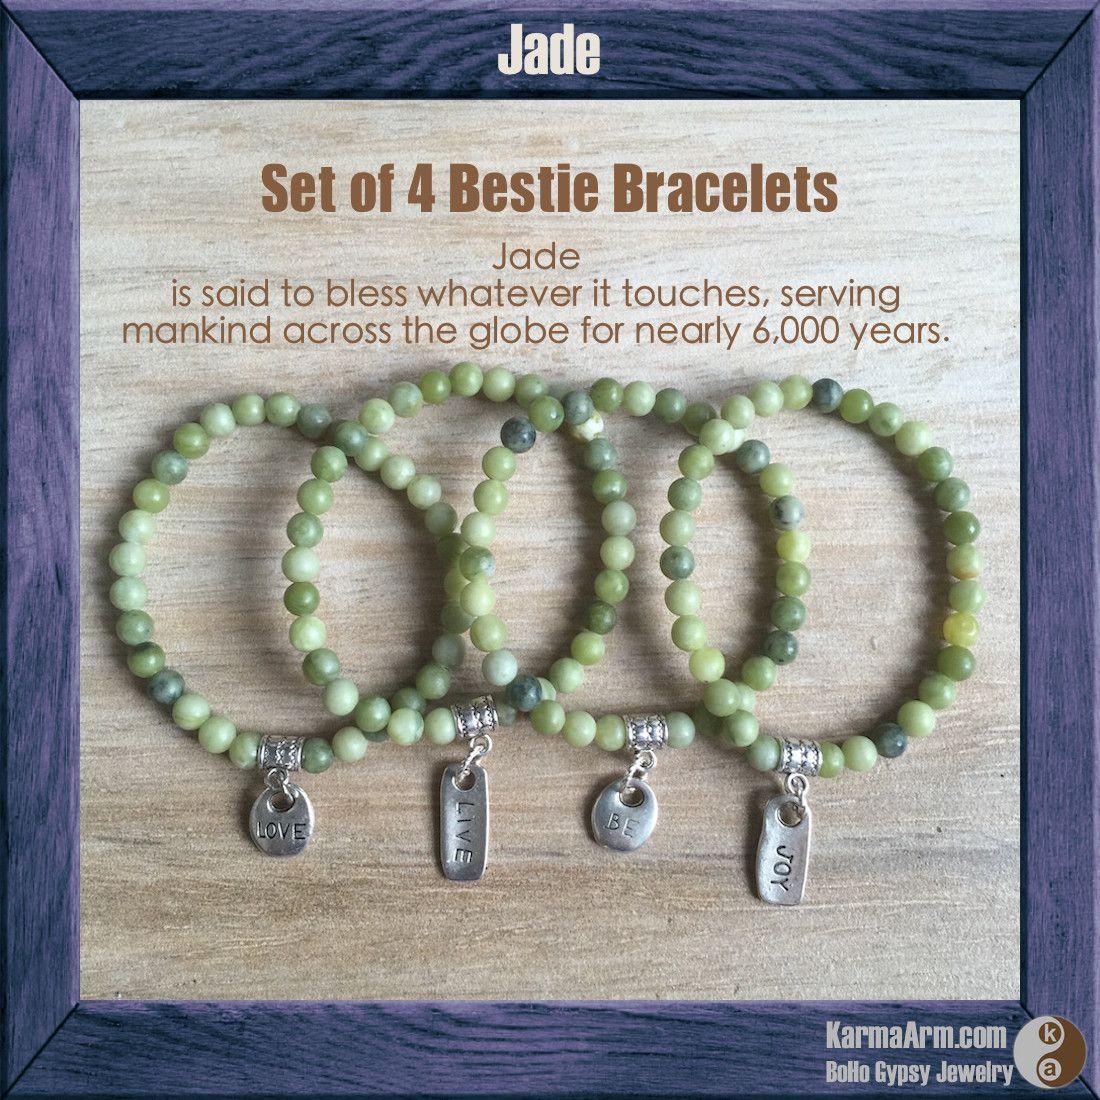 HARMONY: Jade Yoga Mala Bracelet - S/4 JOY + LOVE + LIVE + BE Charms